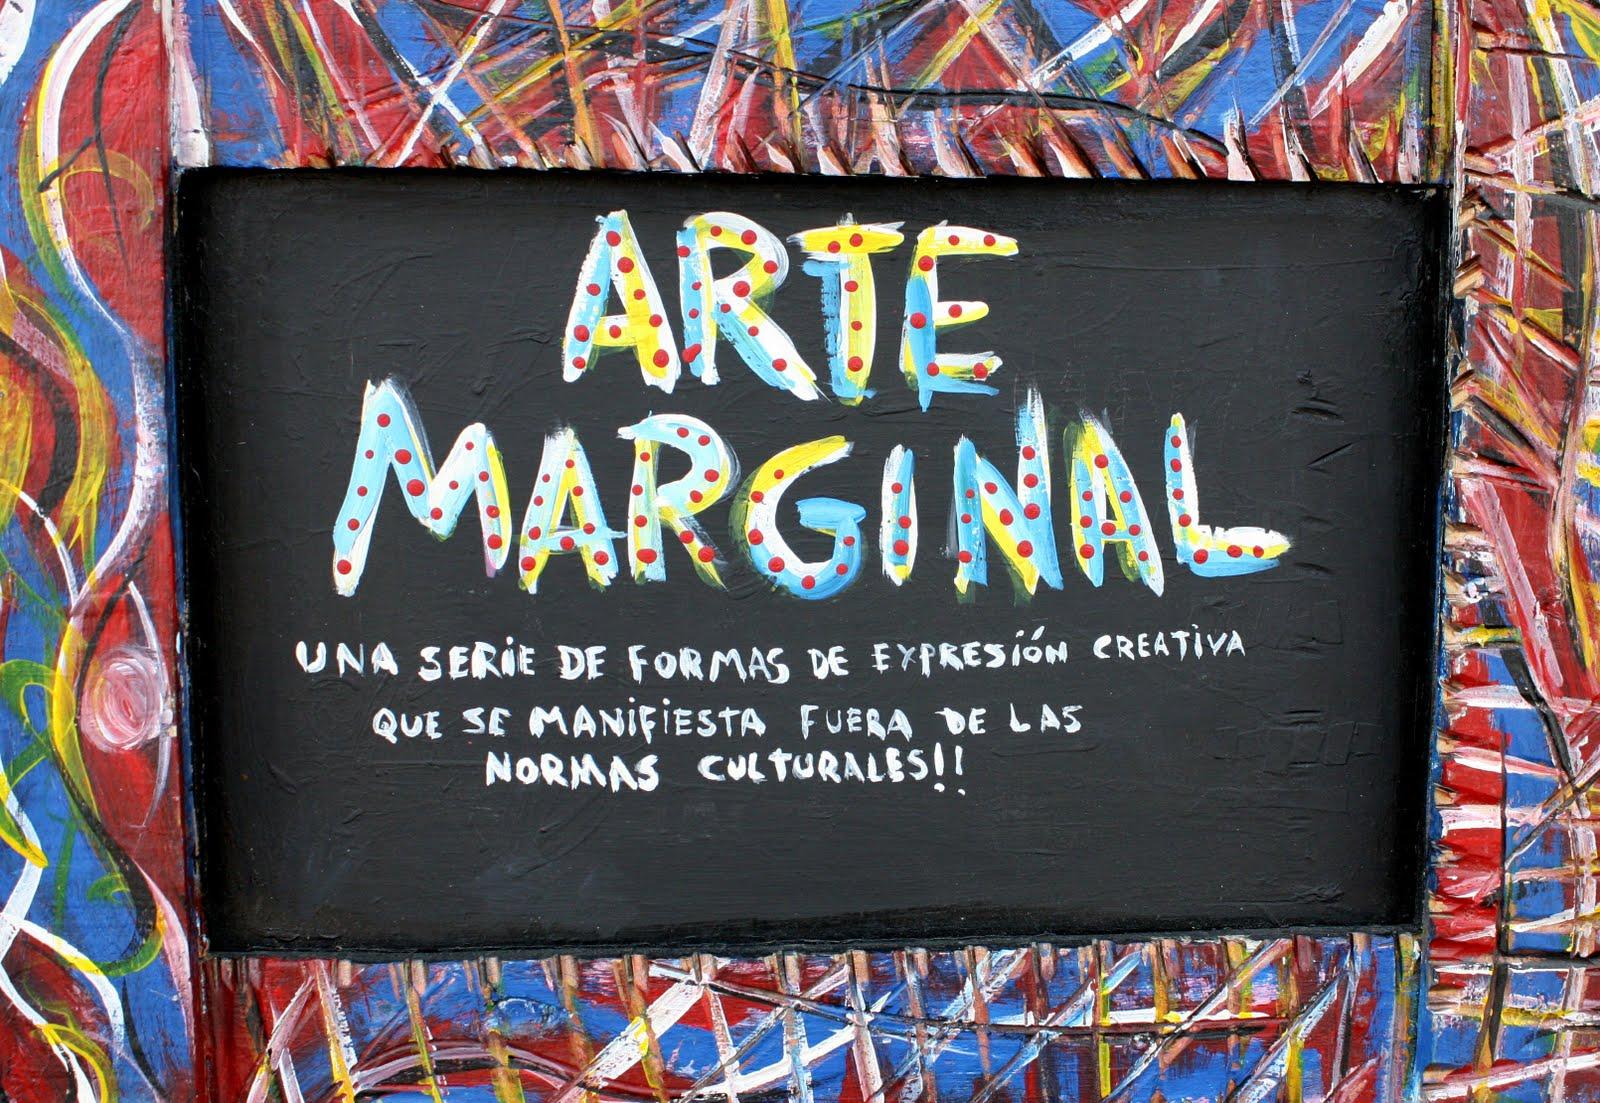 ARTE MARGINAL